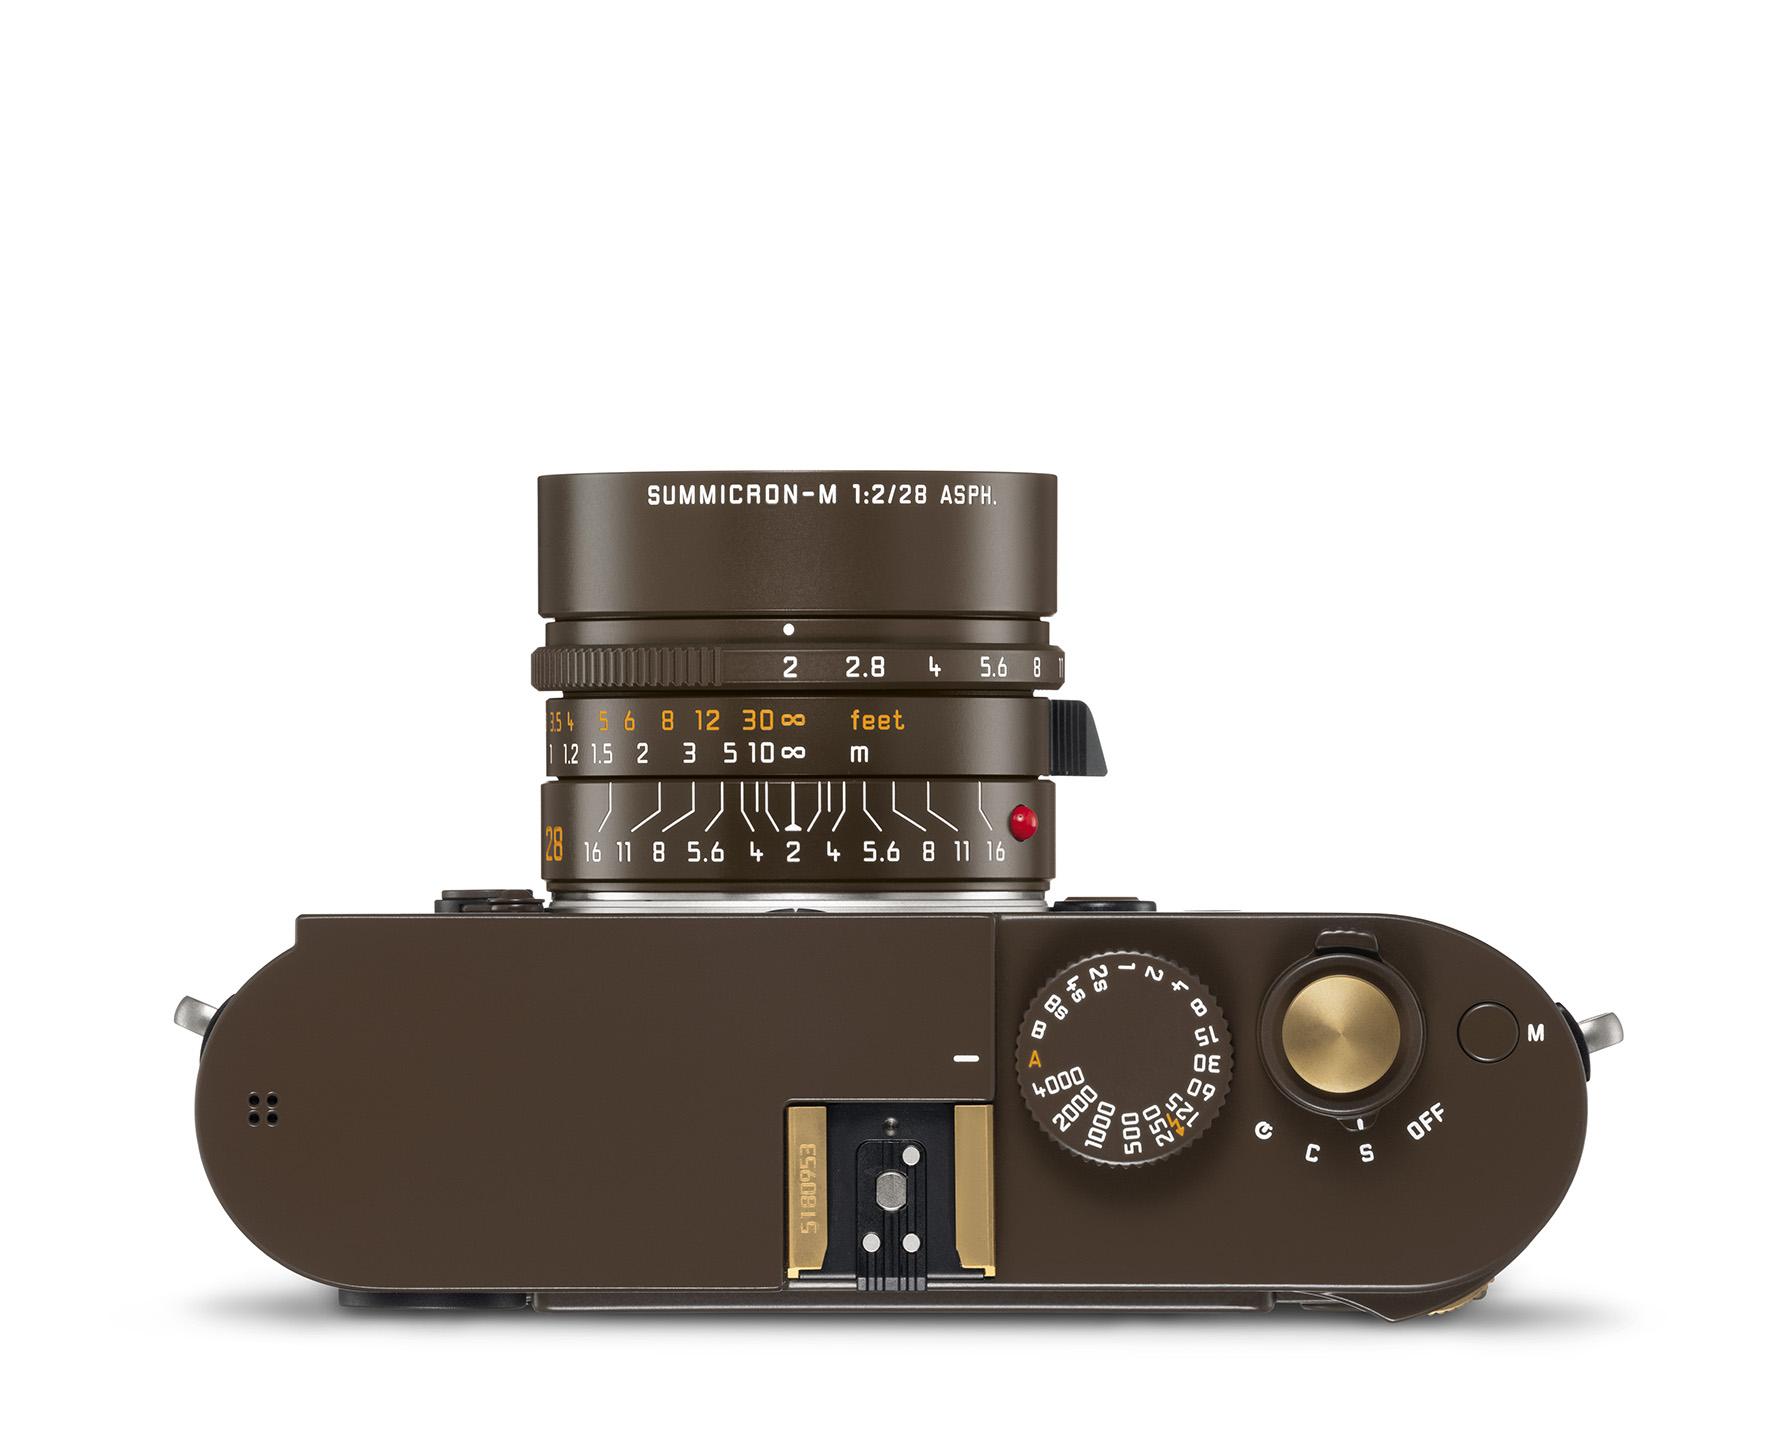 Leica M Monochrom_Drifter+Summicron-M 2_28_TOP_RGB.jpg